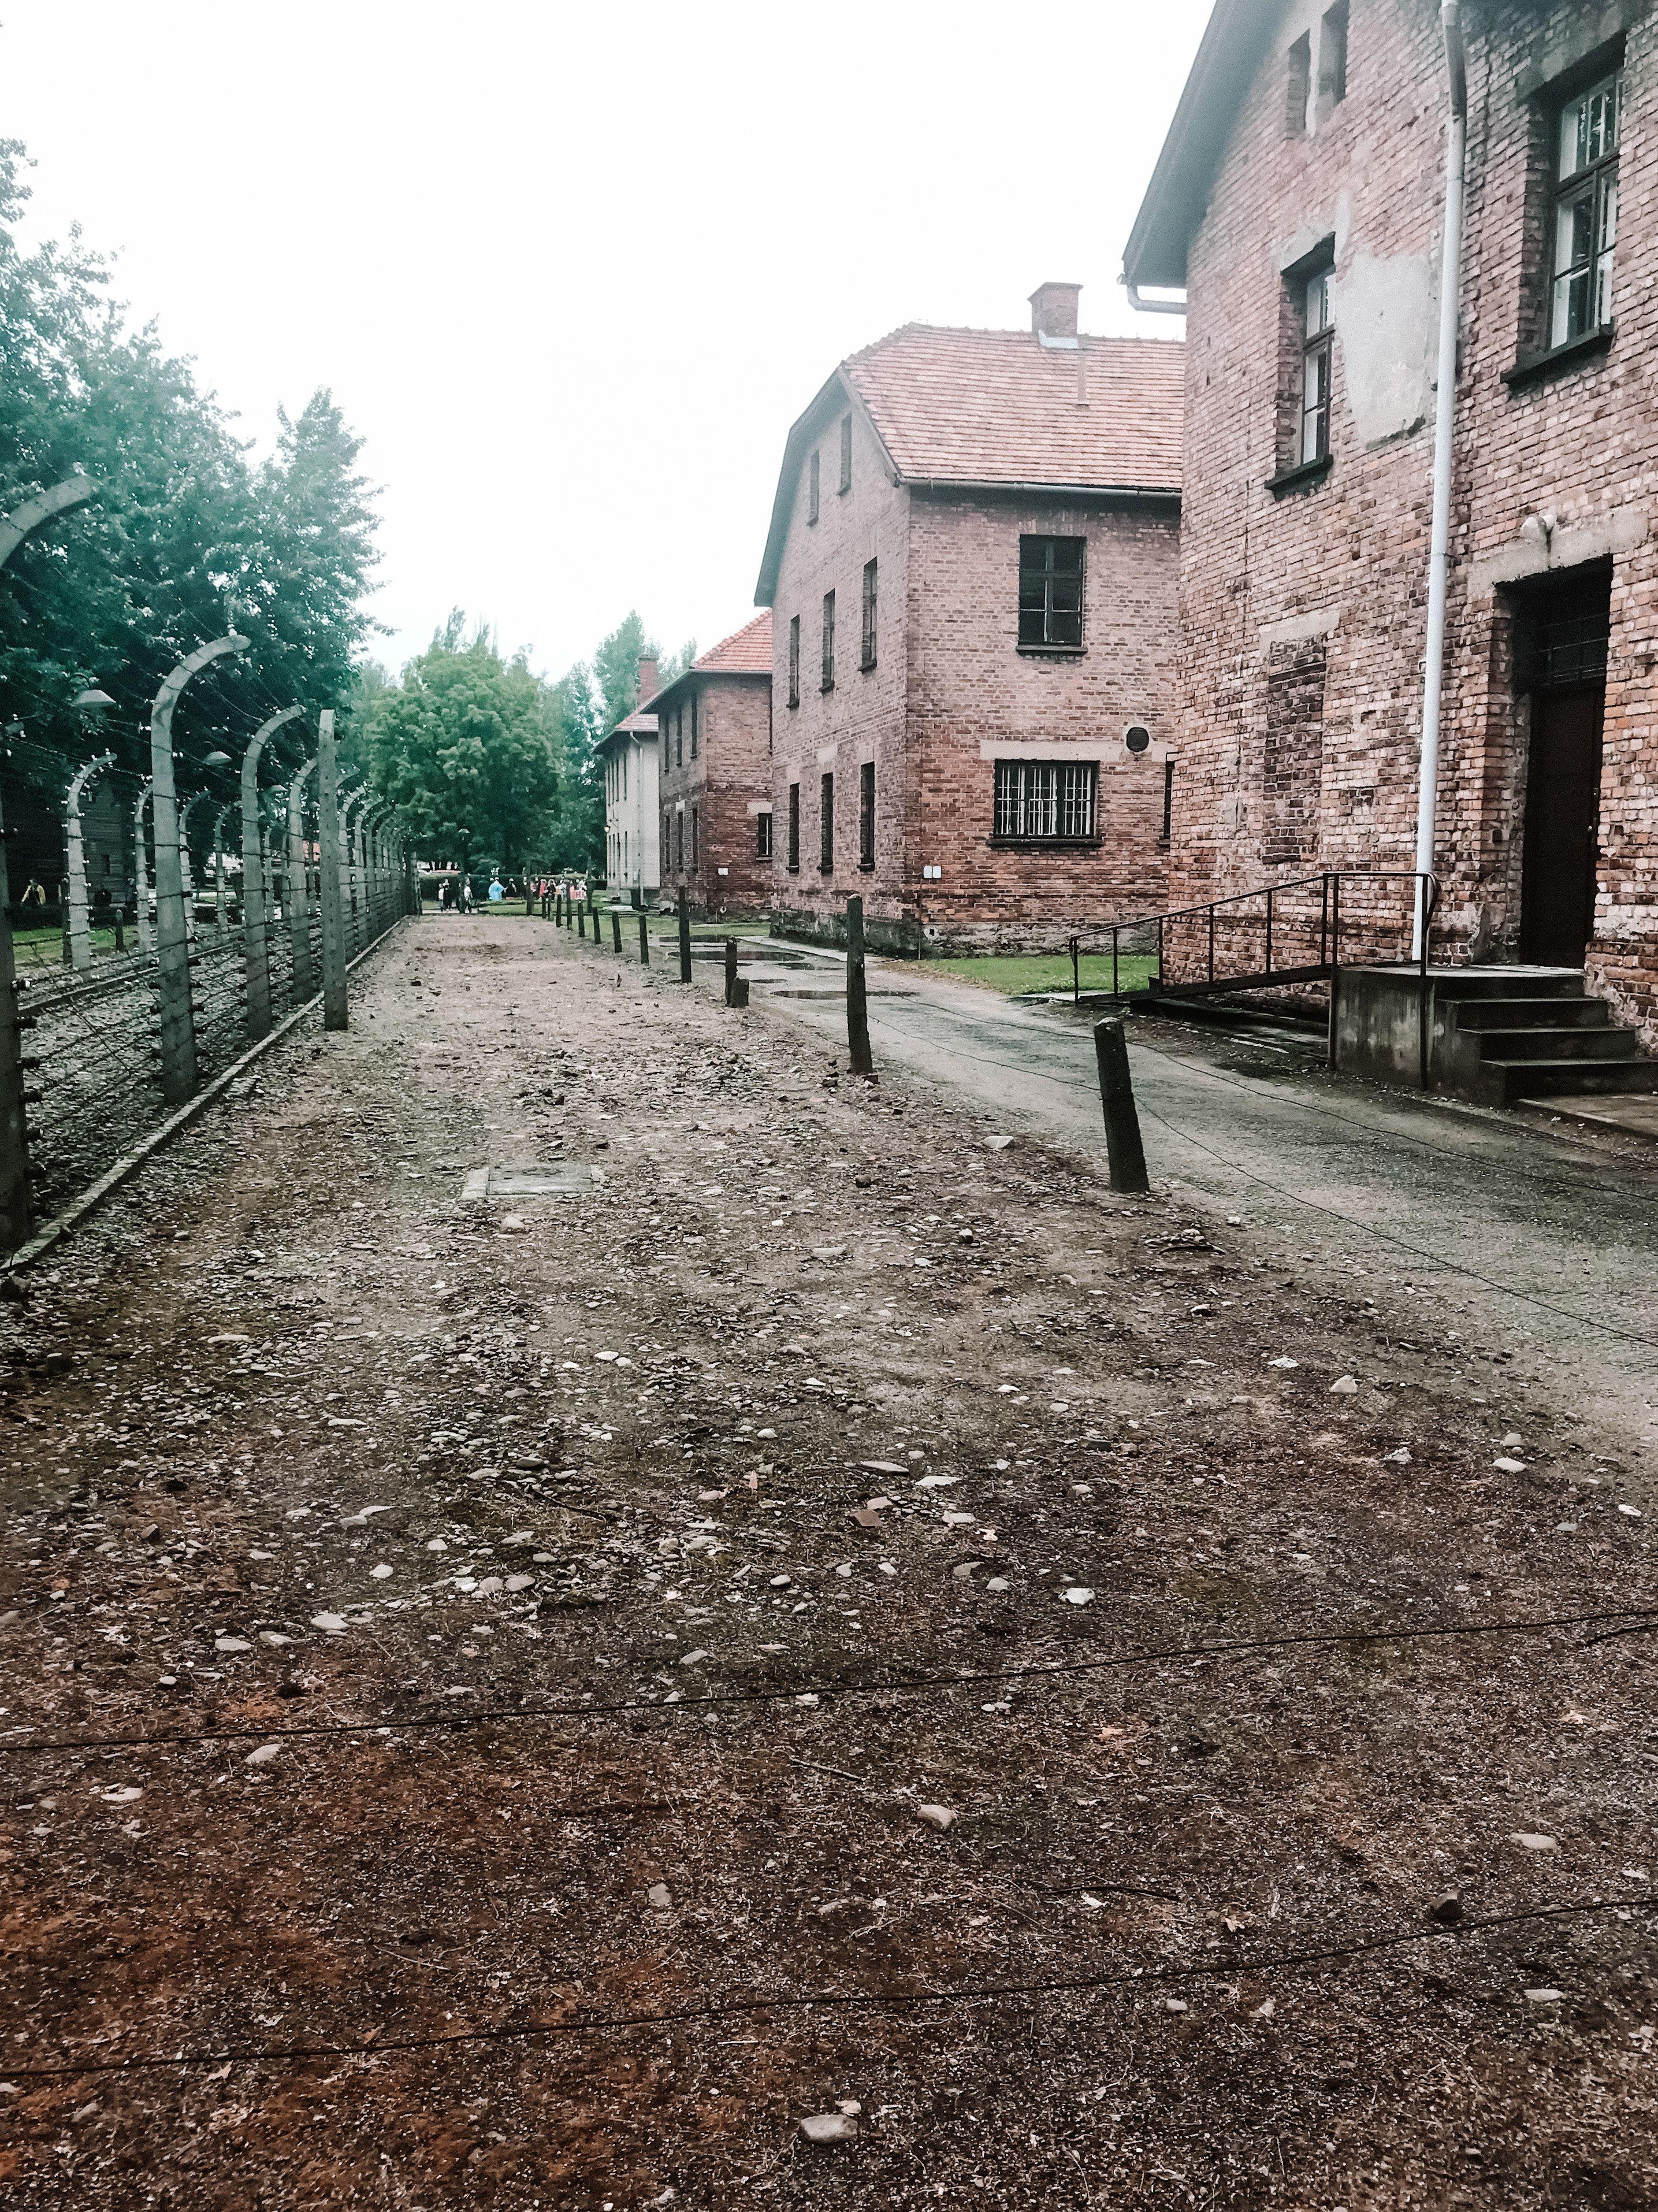 Ausschwitz Birkenau Krakow In 2020 City Trip Europe Travel Krakow